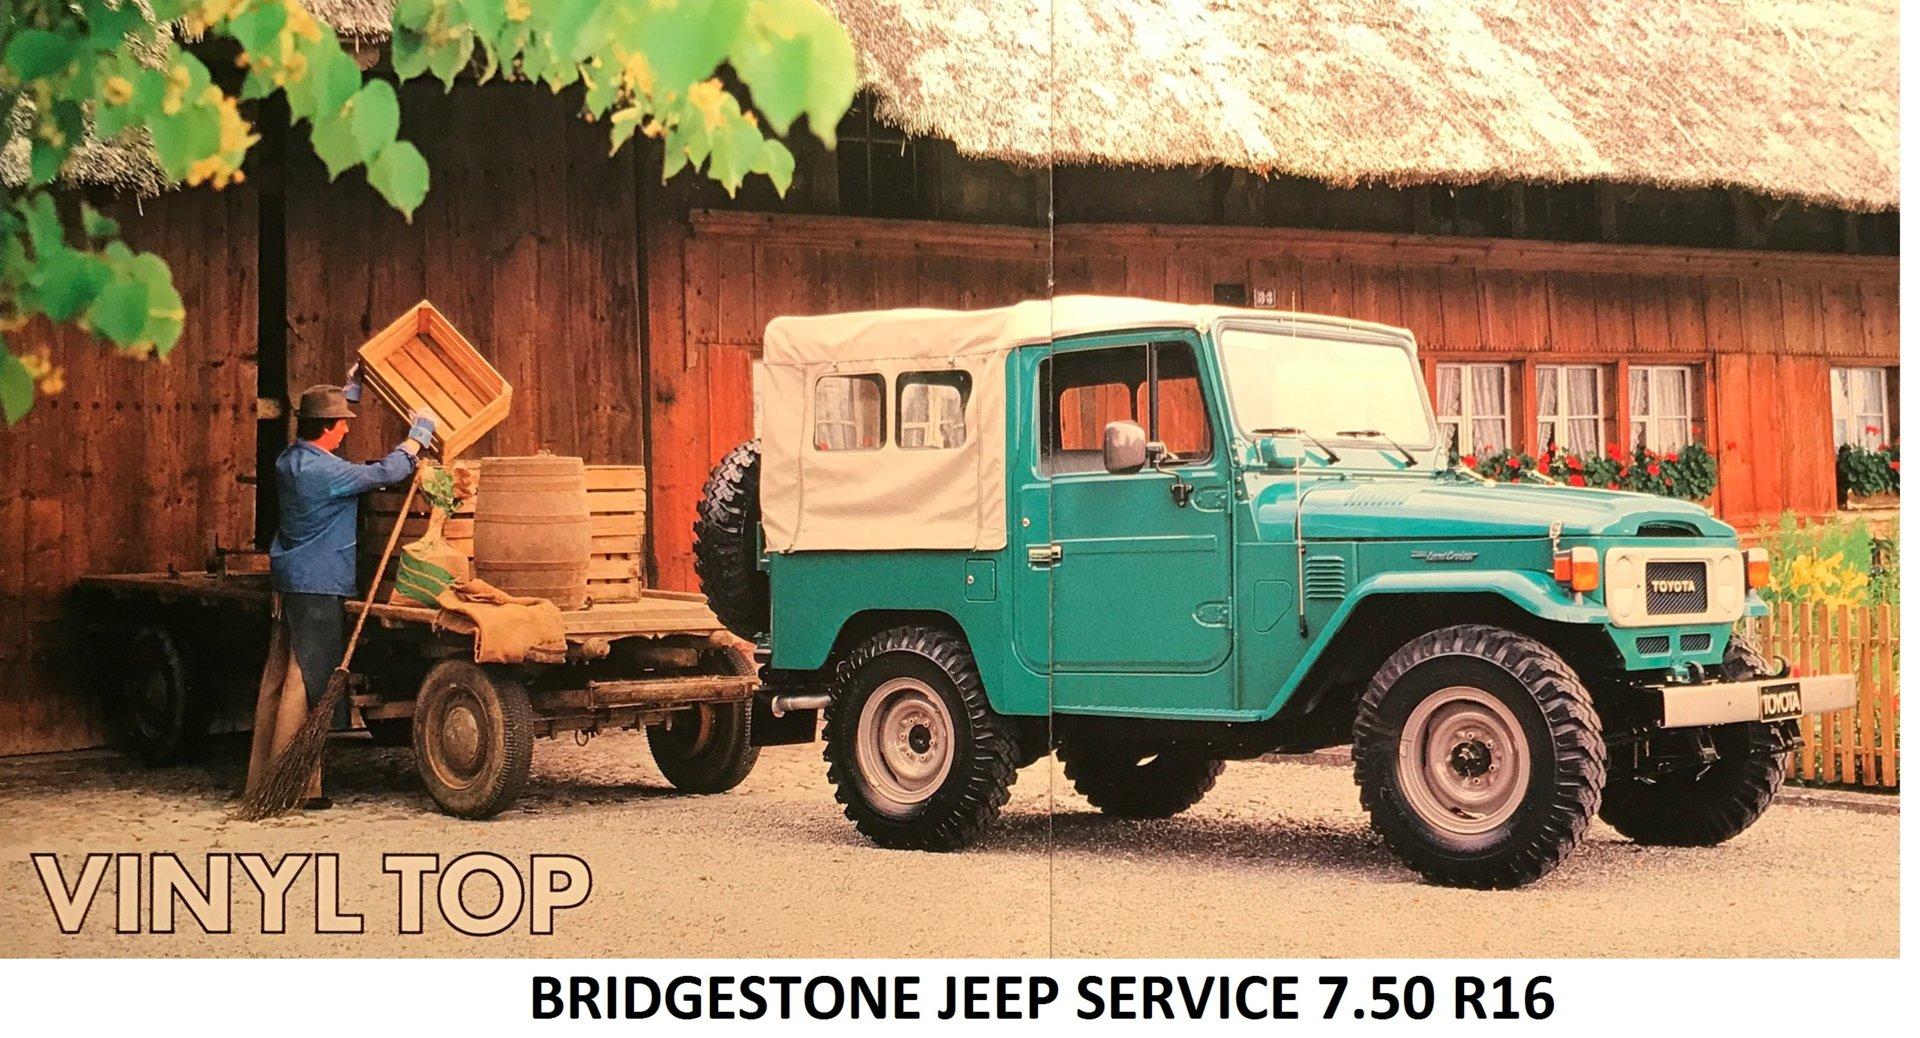 BRIDGESTONE JEEP SERVICE.jpg